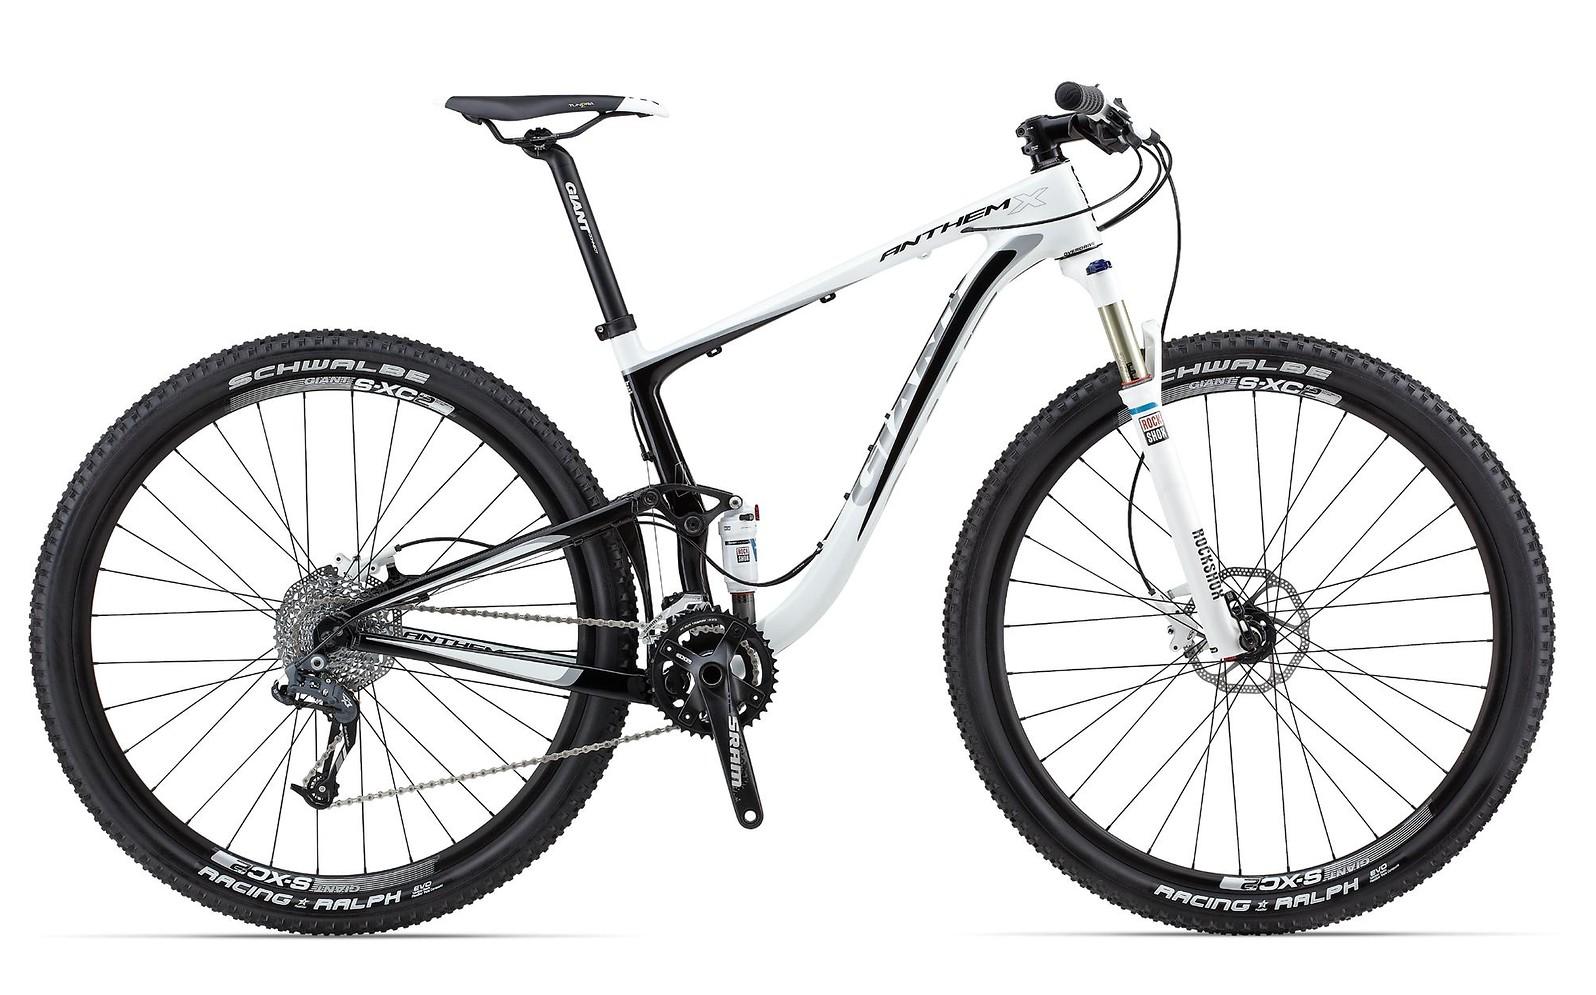 2013 Giant Anthem X Advanced 29er 2 Bike 2013 Anthem_X_Advanced_29er_2